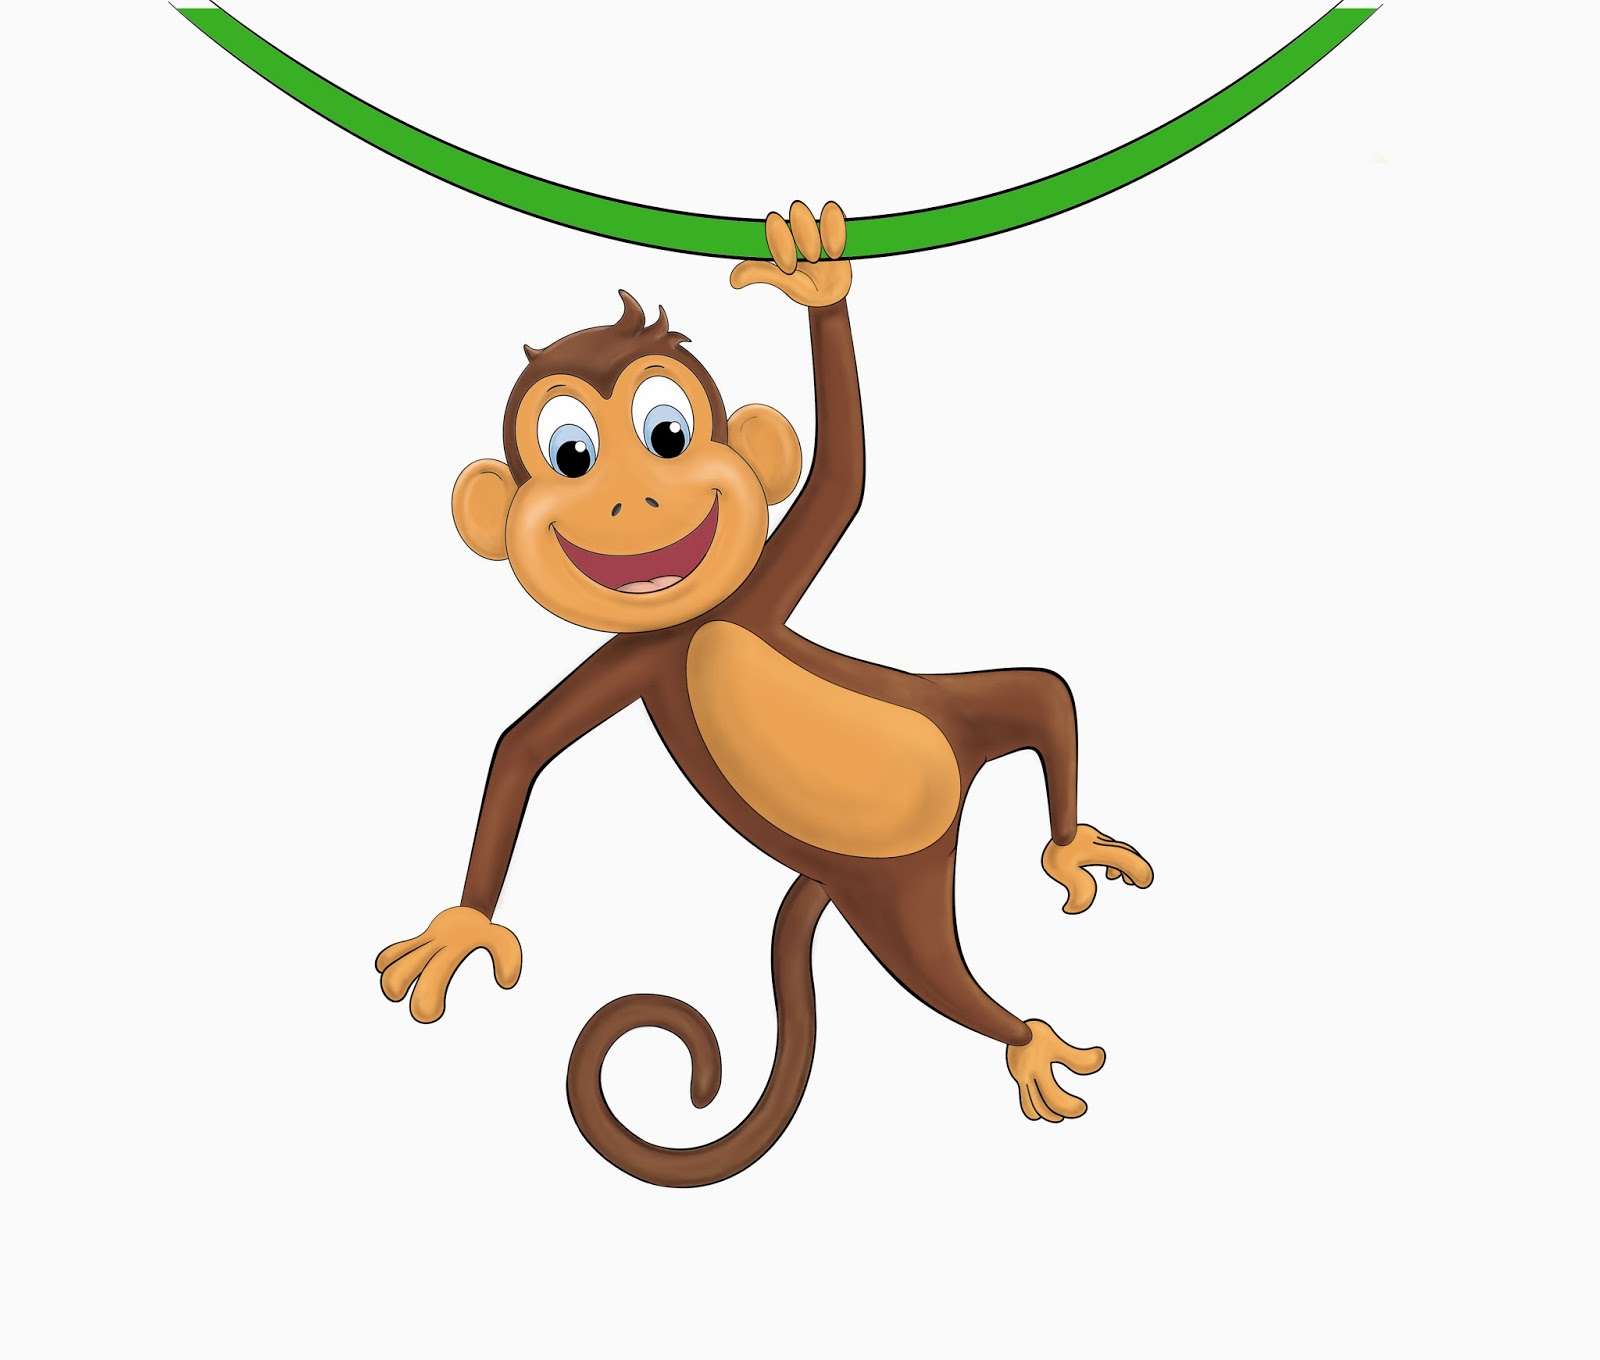 hanging monkey template-hanging monkey template-7